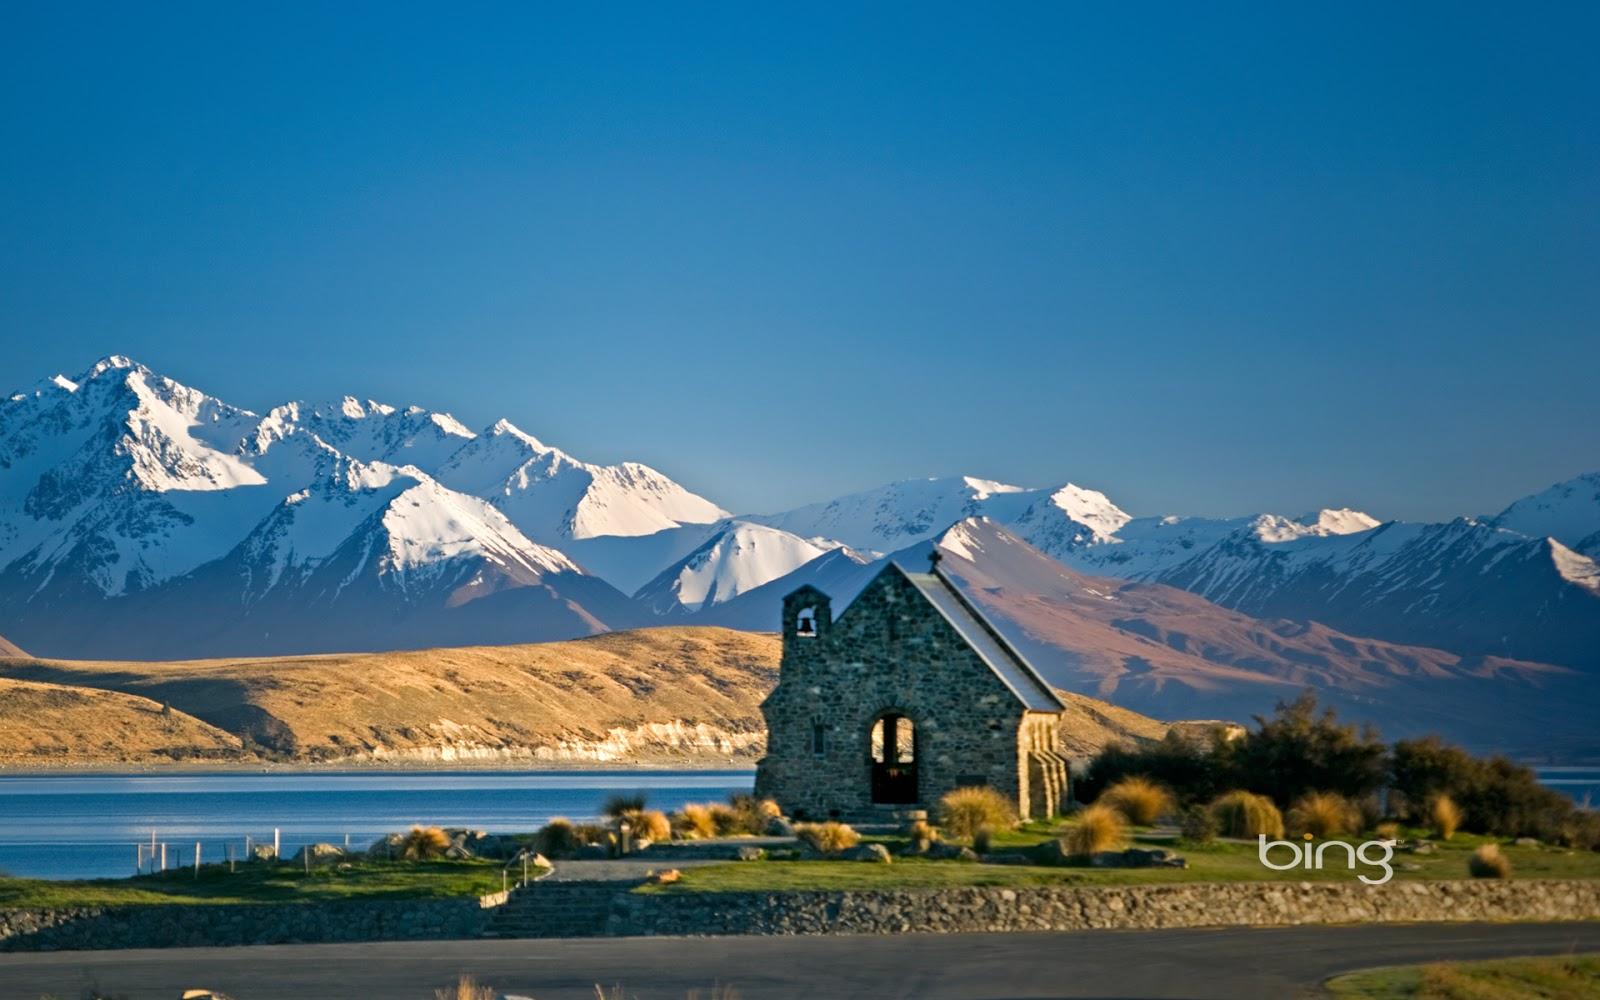 Christchurch Wallpaper: Travel Trip Journey : Lake Tekapo New Zealand